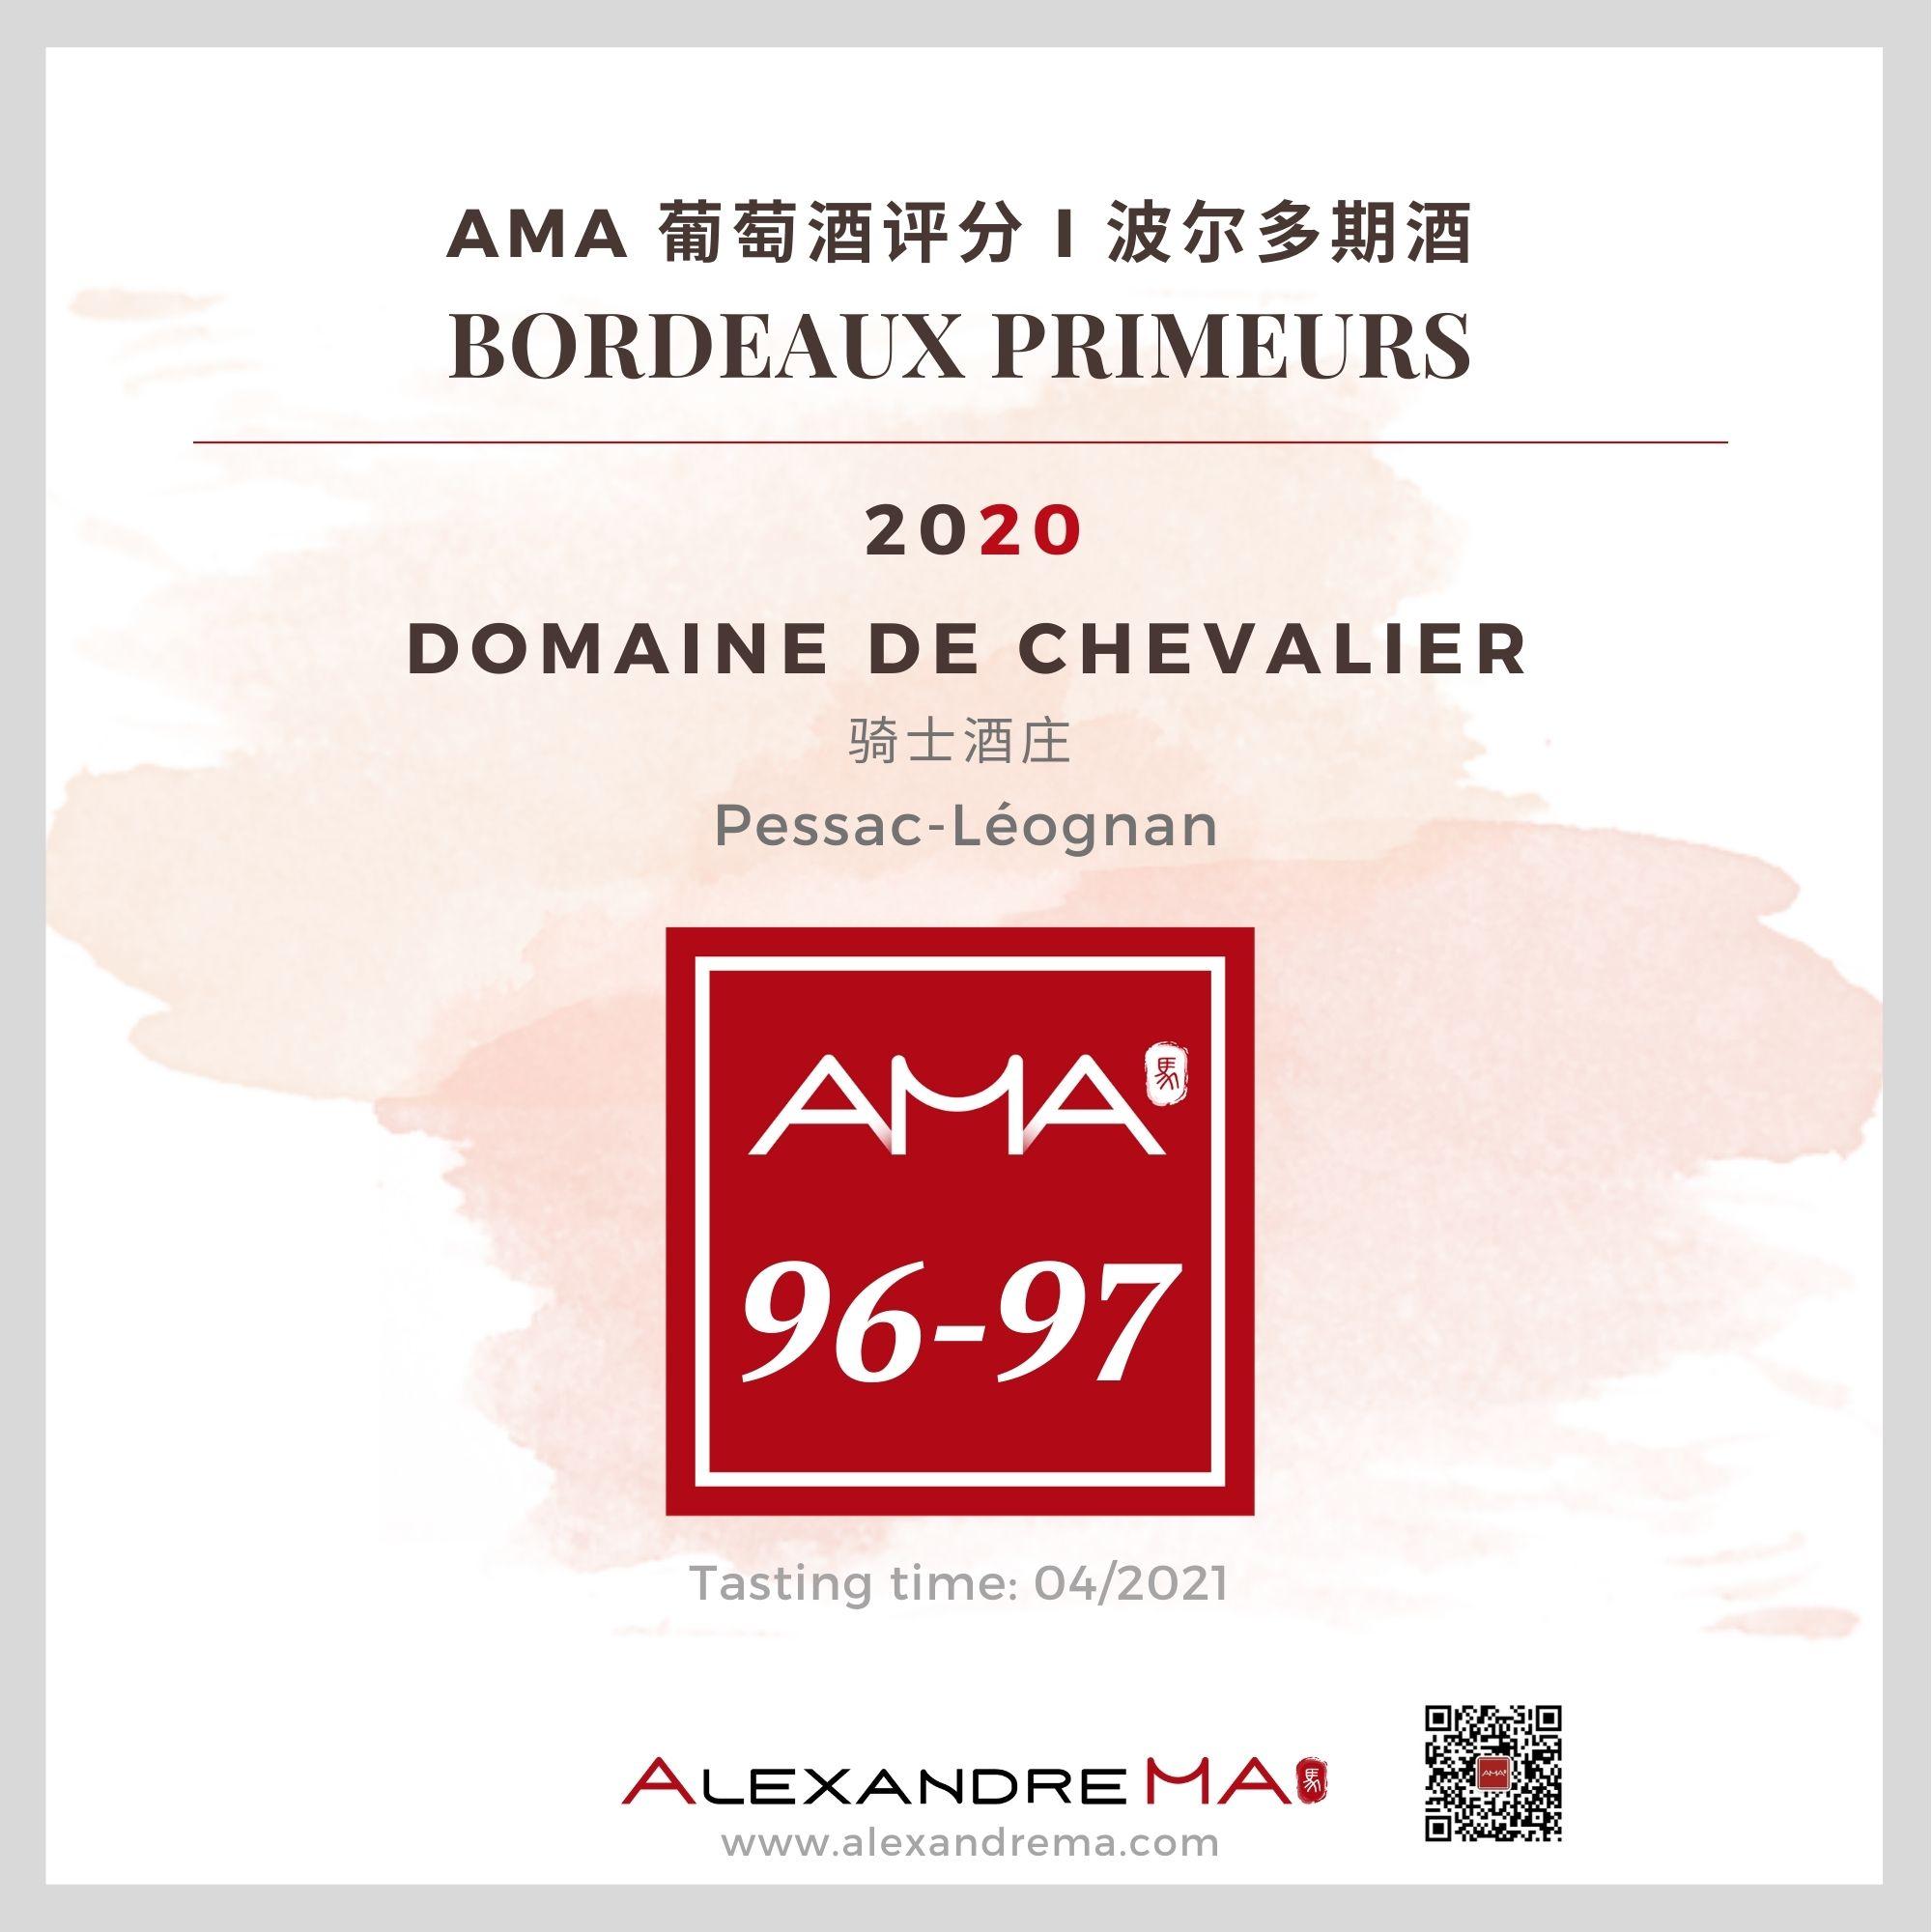 Domaine de Chevalier 2020 骑士酒庄 - Alexandre Ma